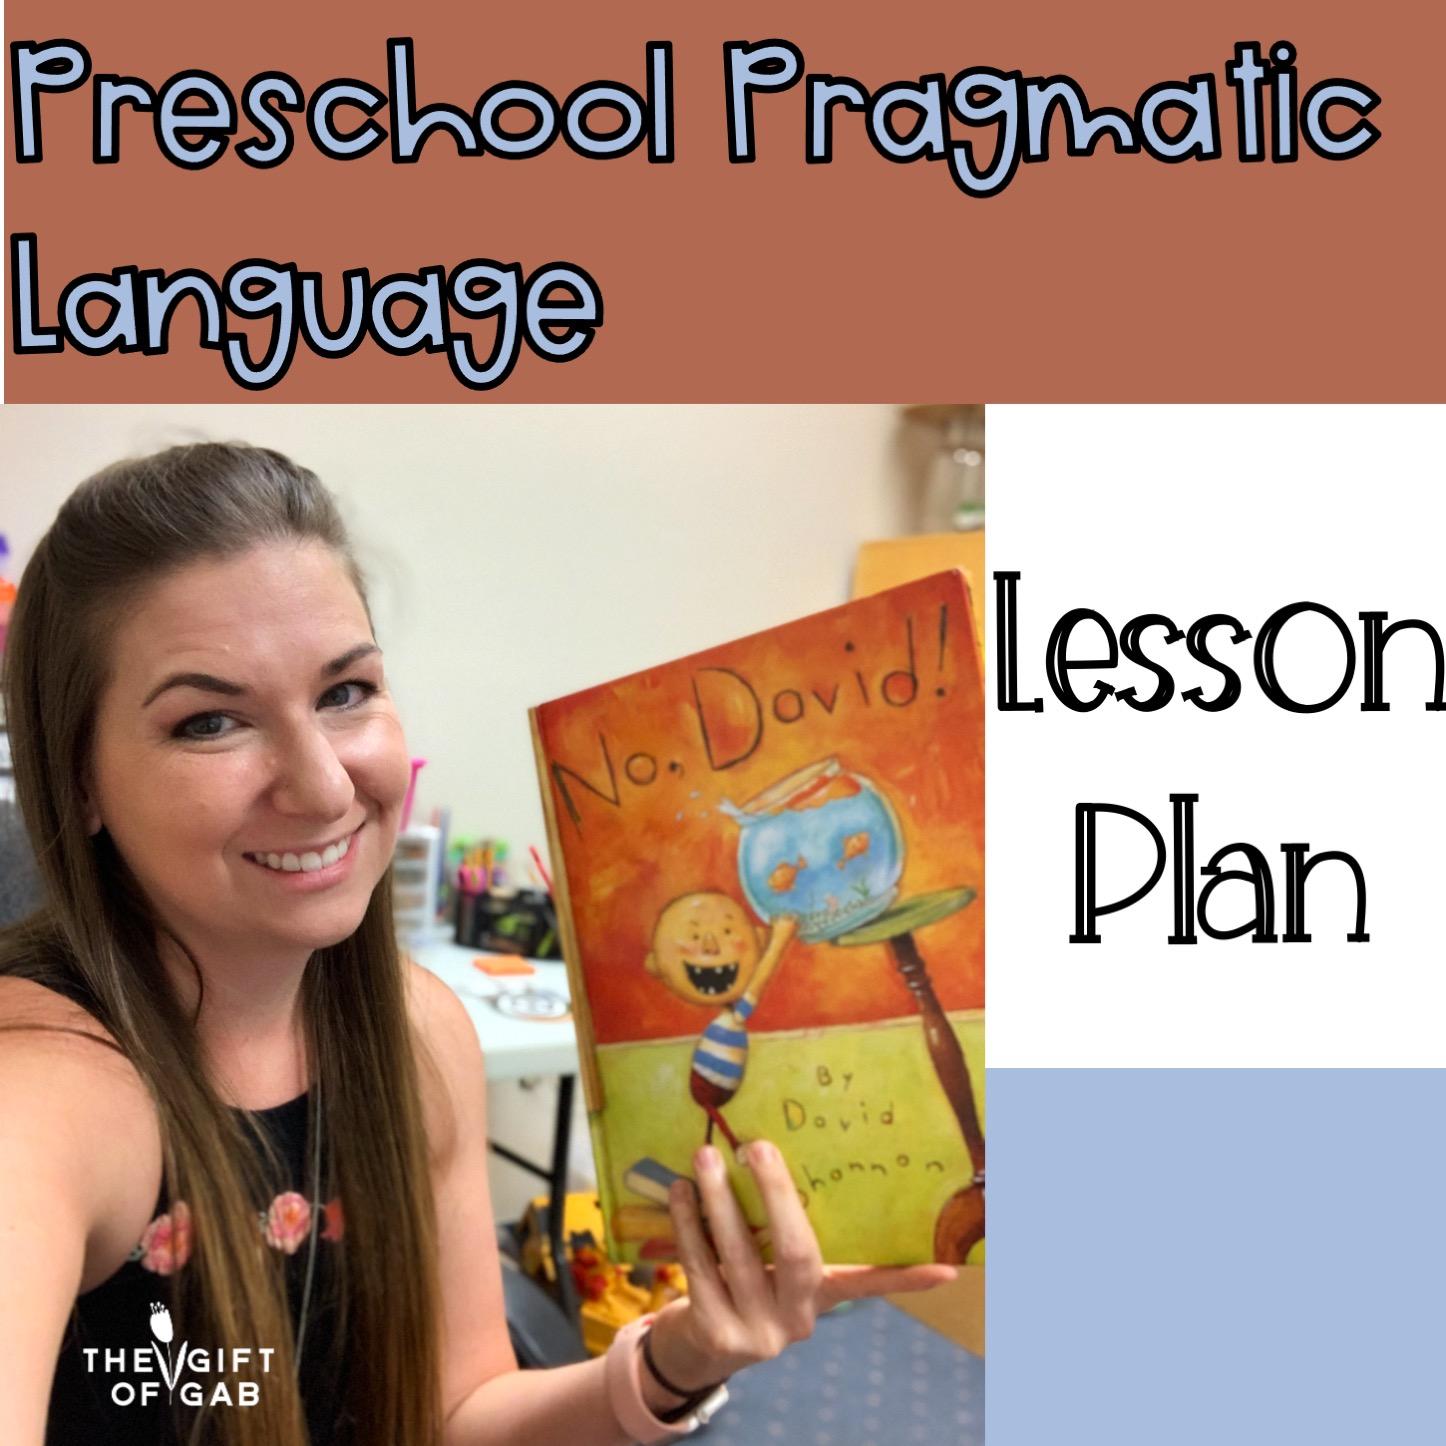 Preschool Pragmatic Language Activitie